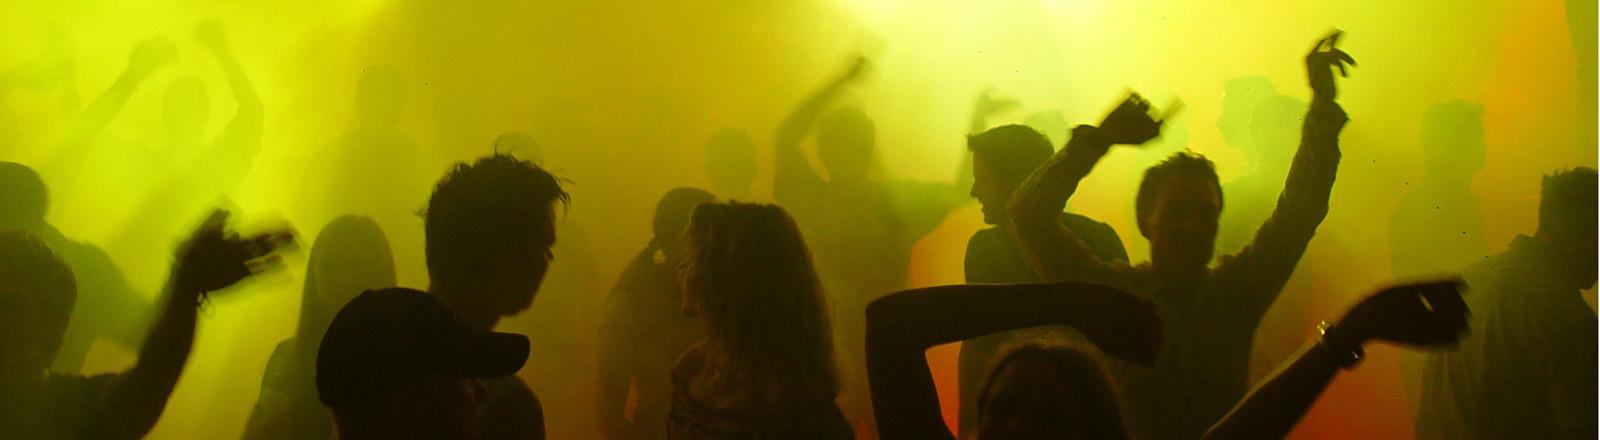 Tanzende Leute im Club